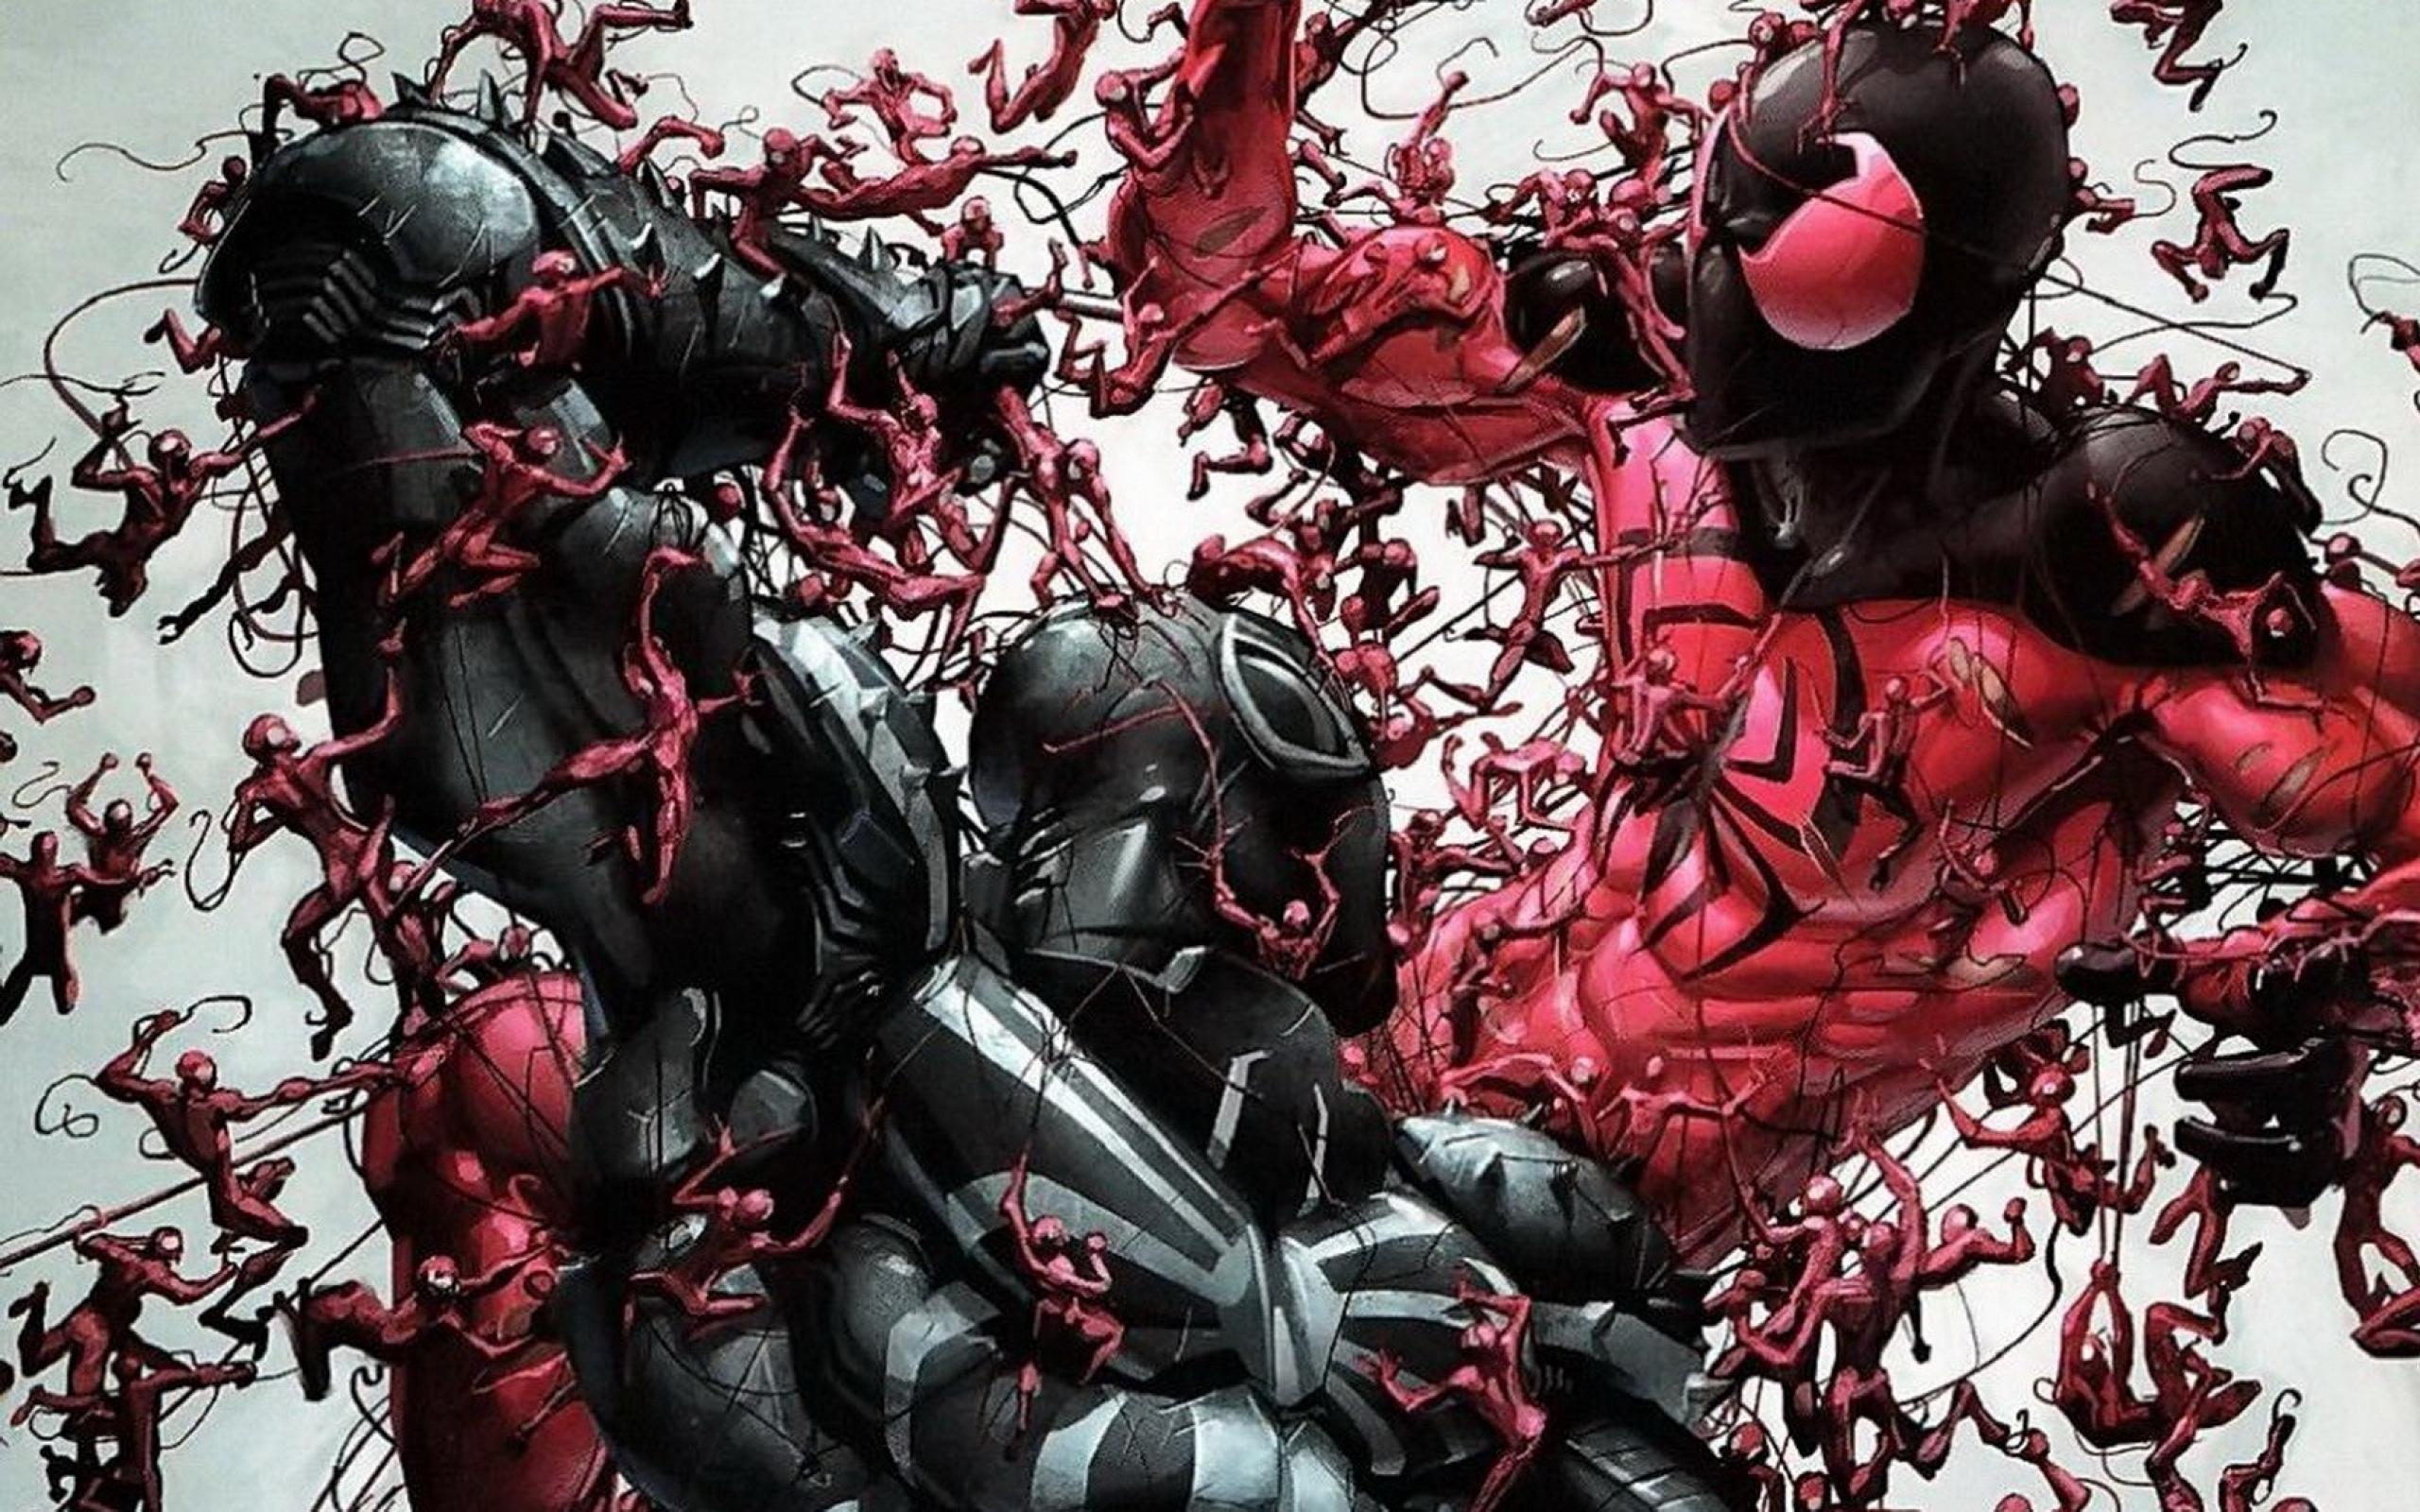 venom carnage marvel comics marvel scarlet spider 1920x1080 wallpaper 2560x1600